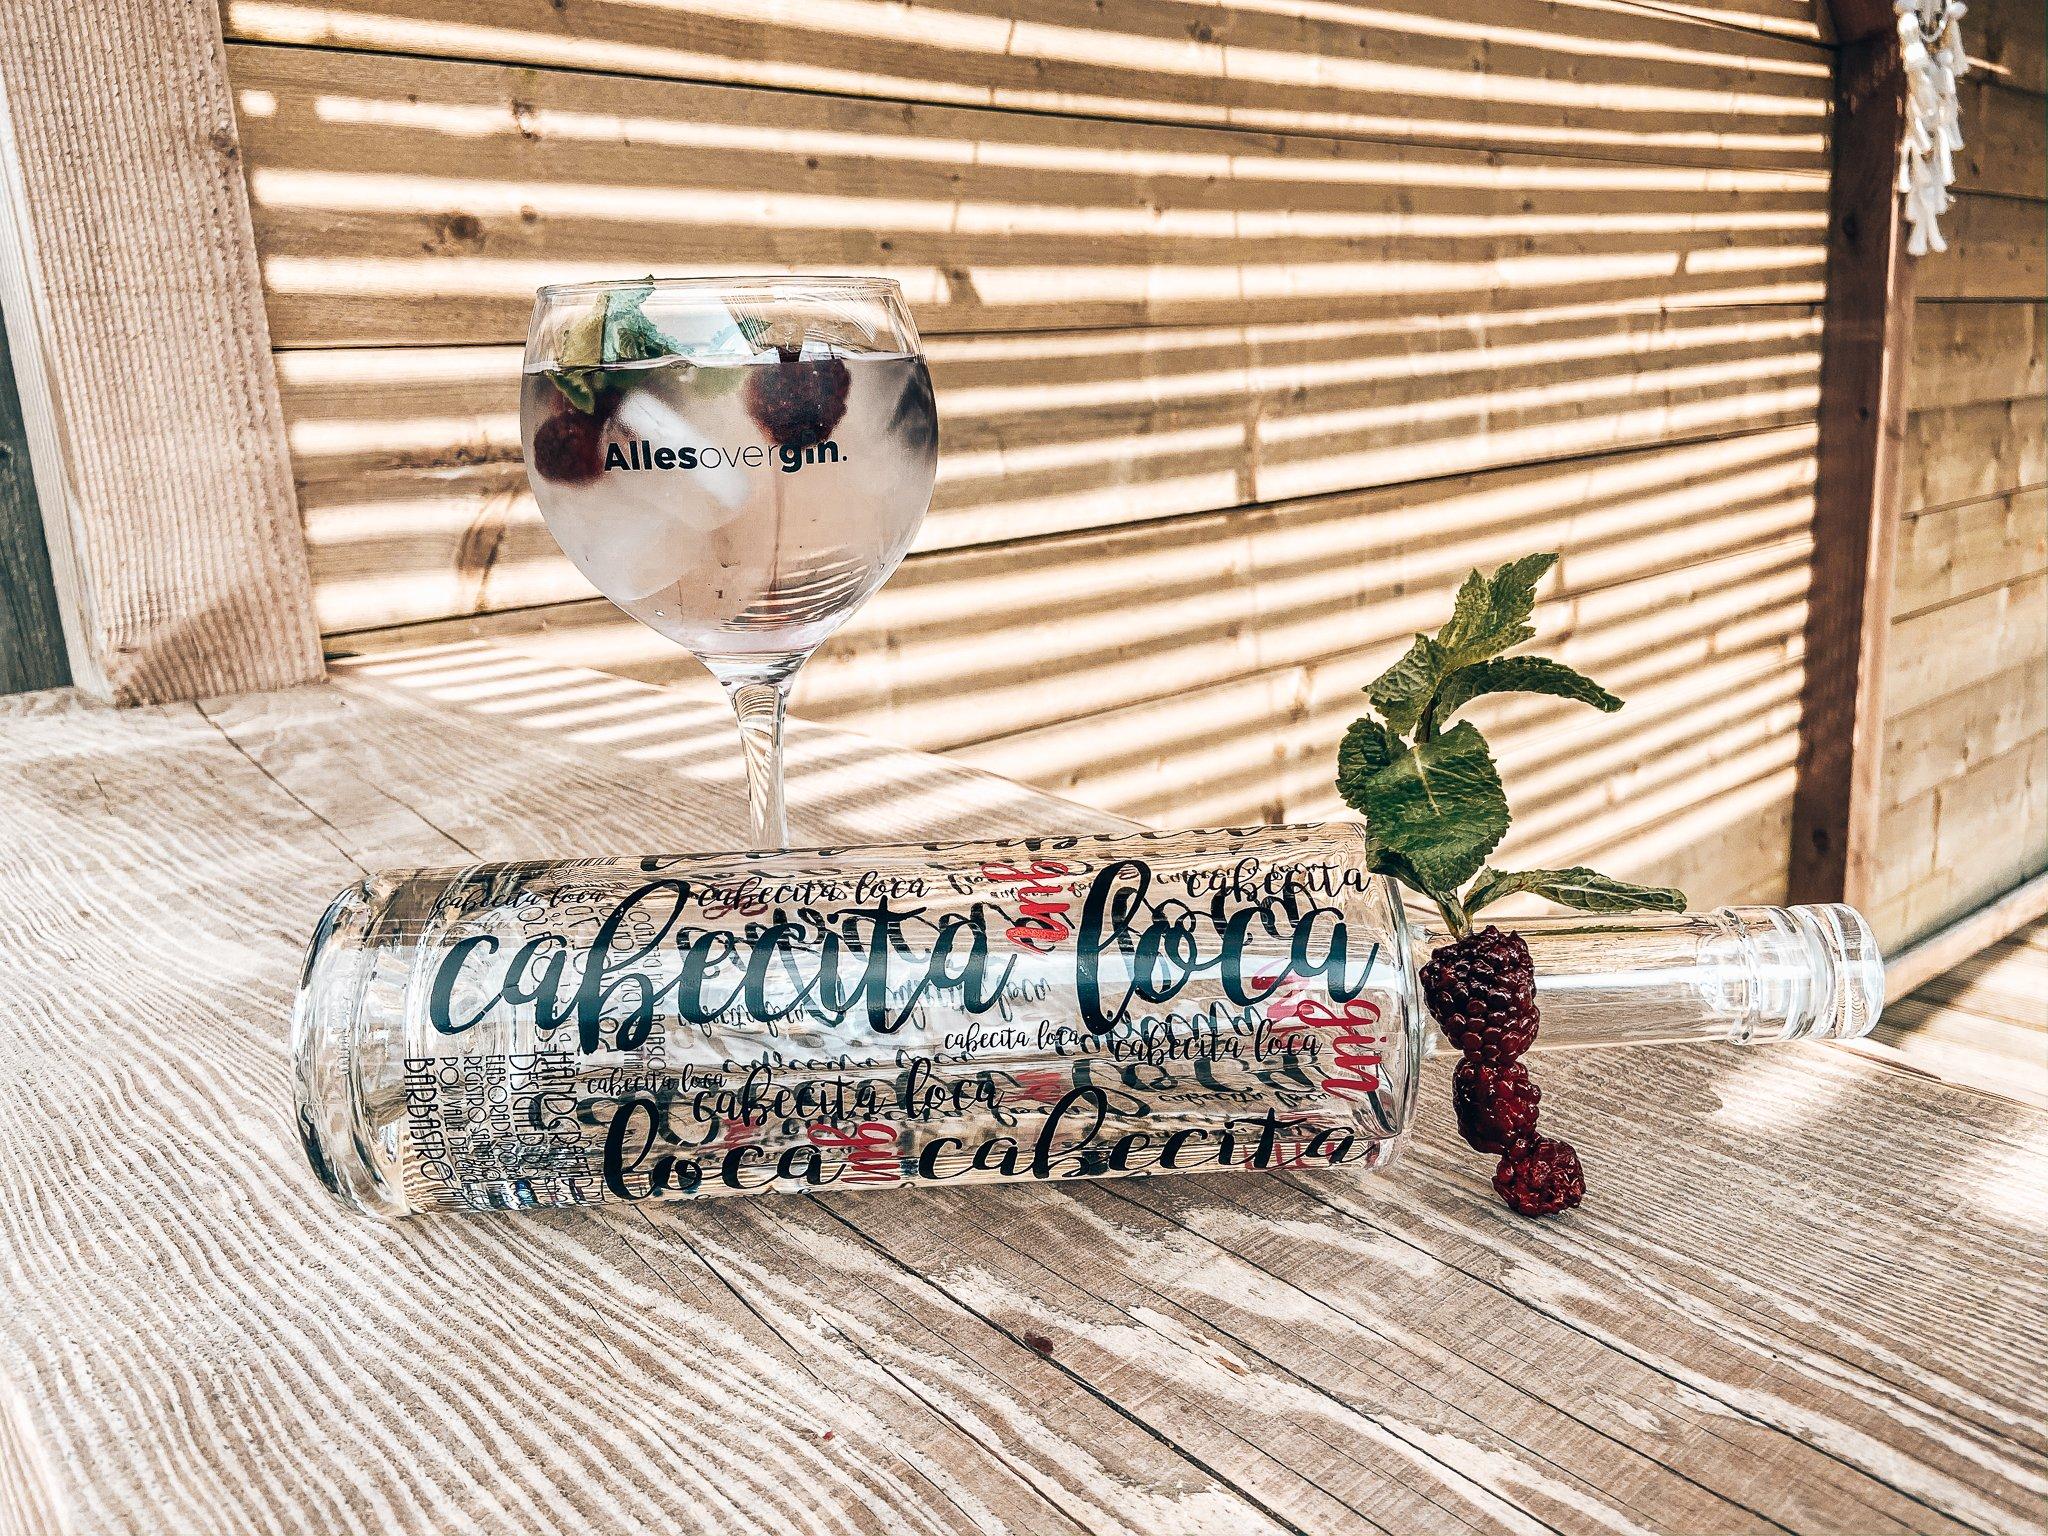 Perfect serve, Cabecite Loca Essential Gin, Alles over gin.